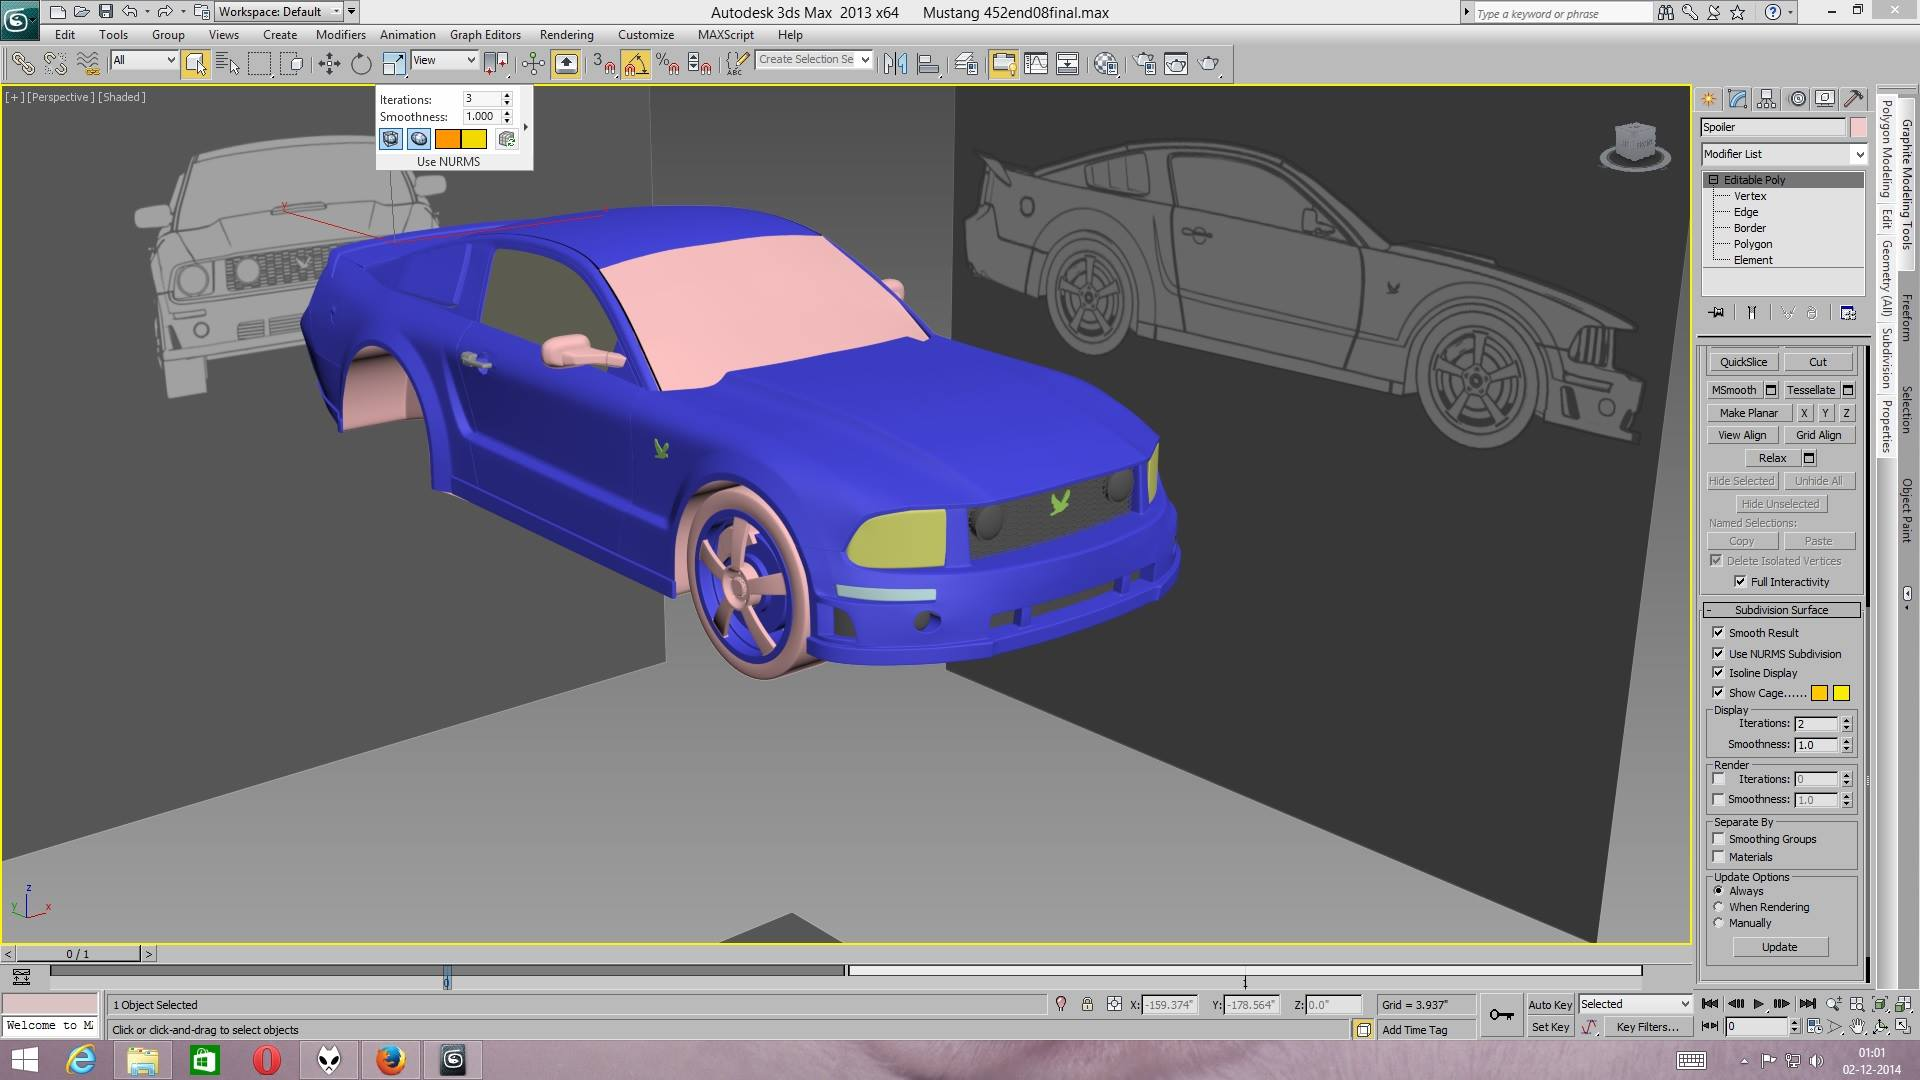 Studio setup for rendering Cars using VRay - Autodesk Community- 3ds Max